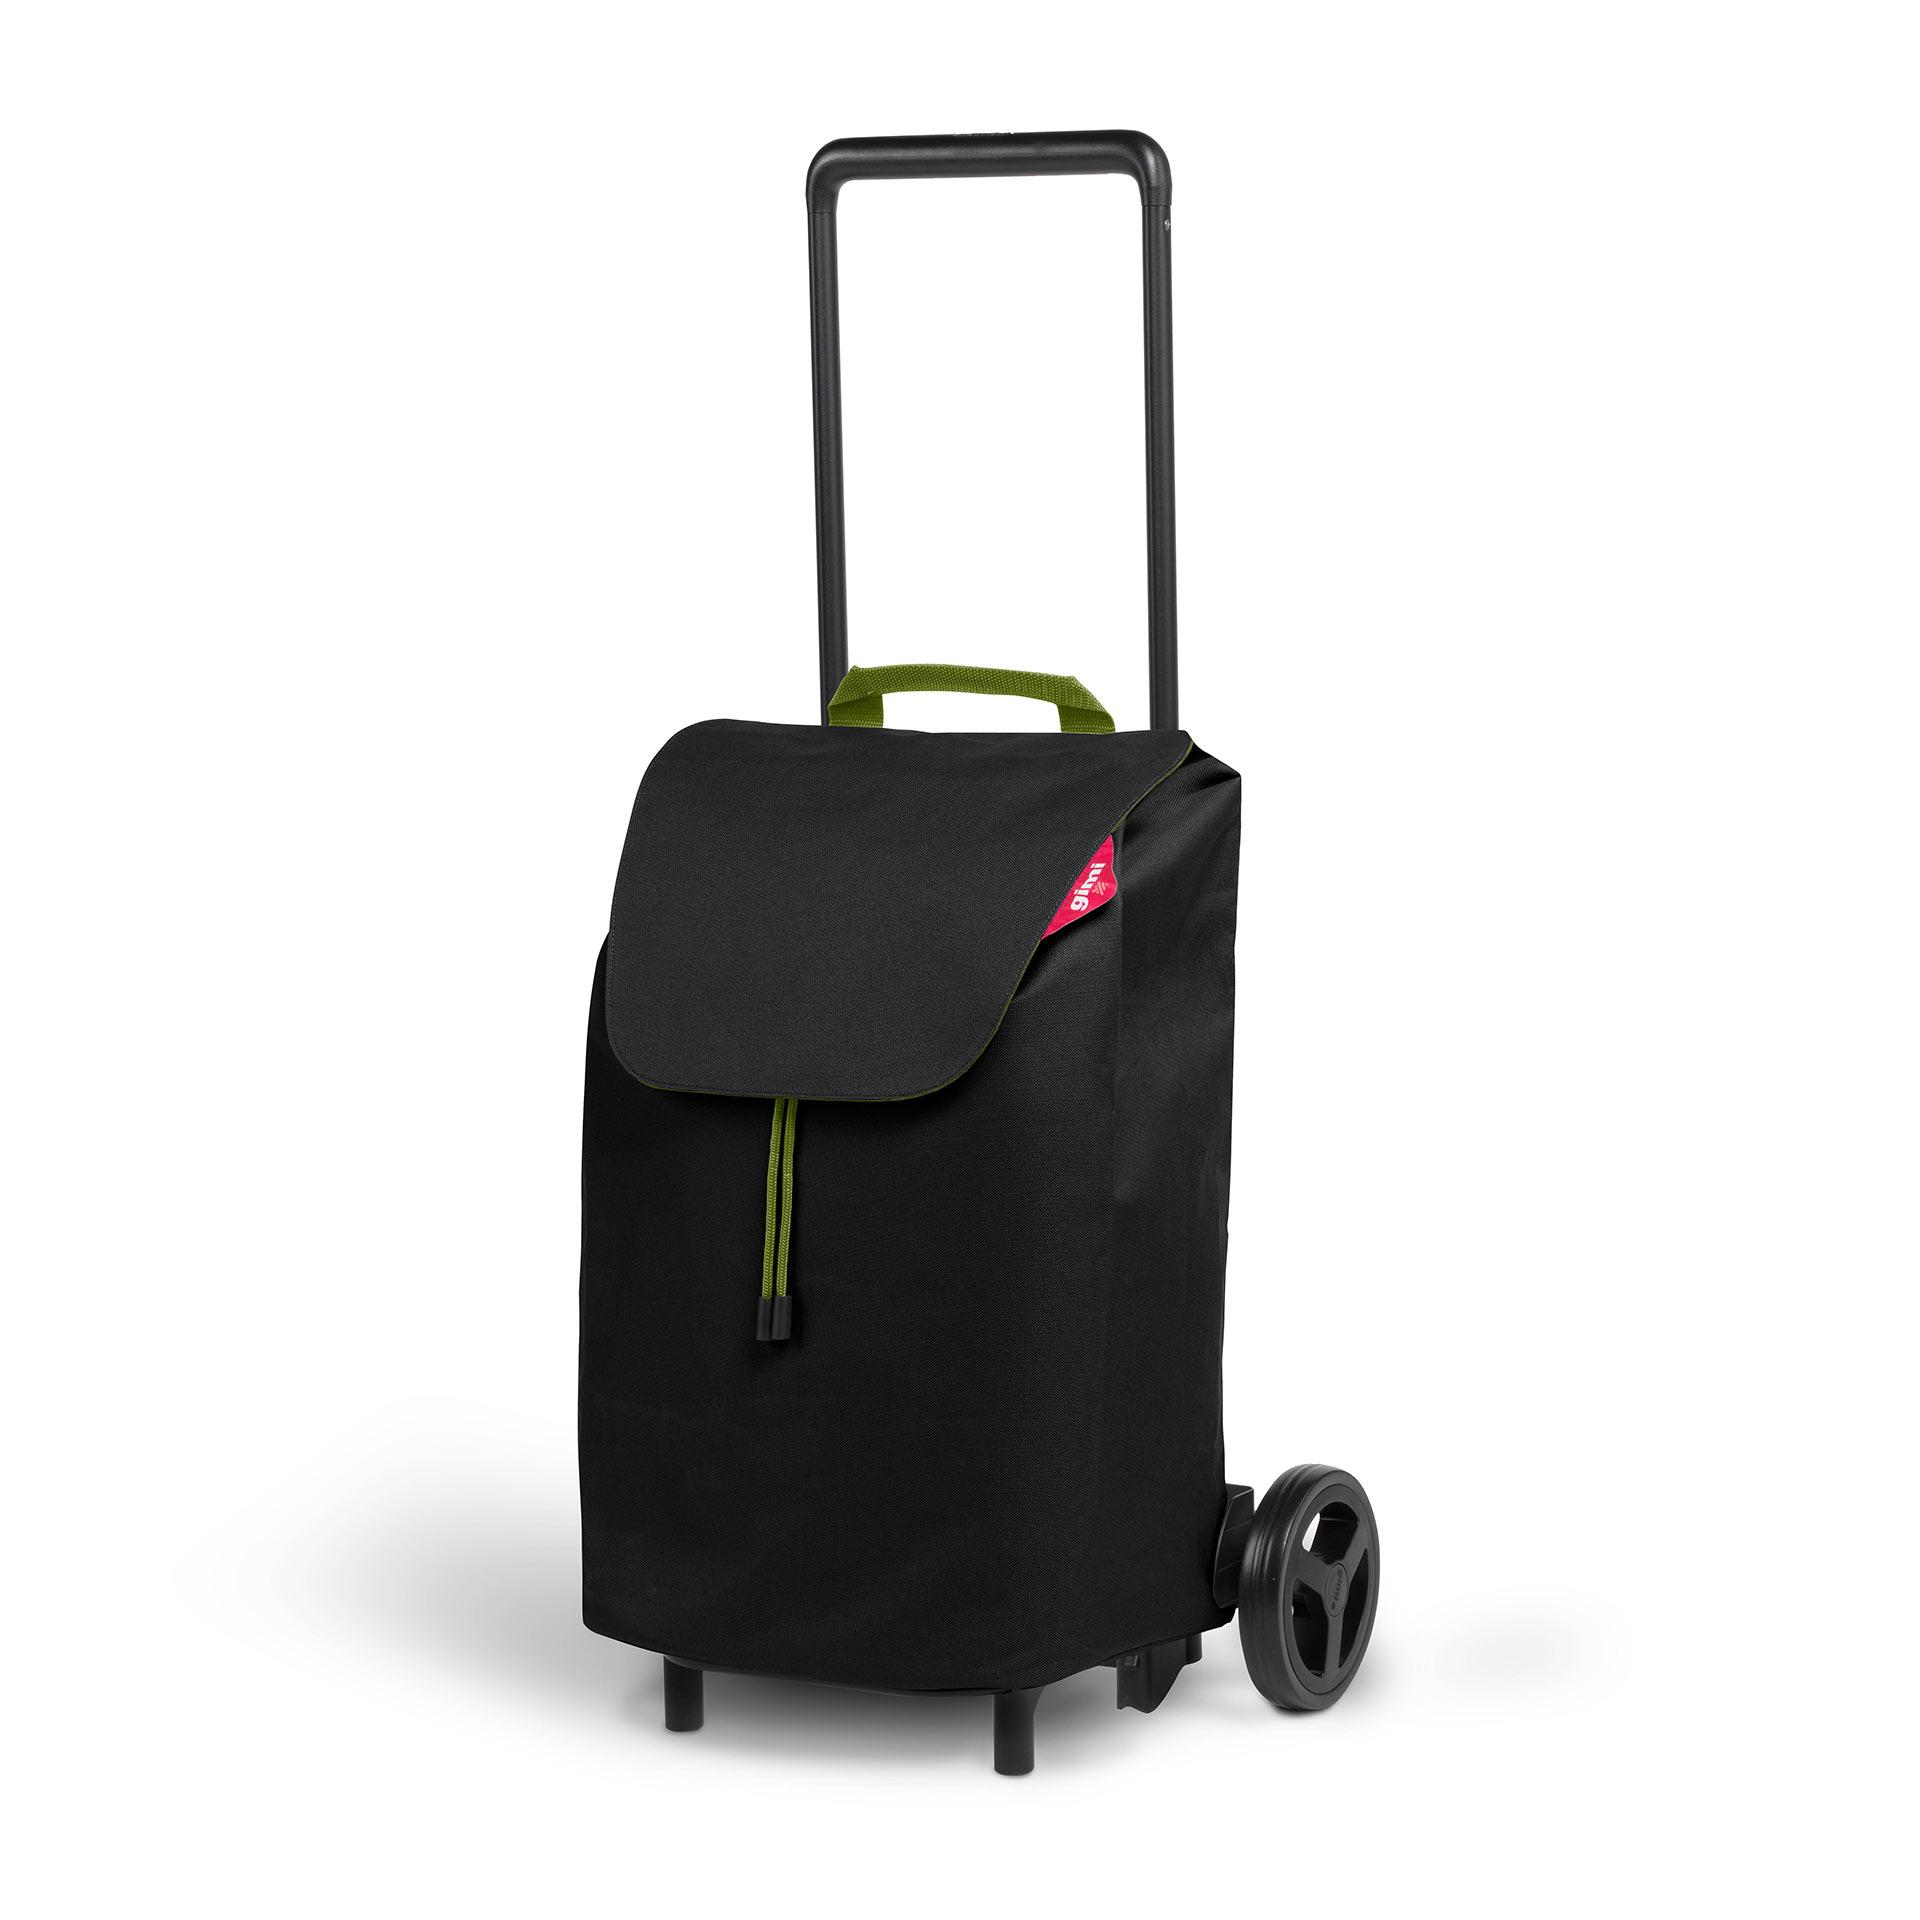 Trolley Design Gimi Easy Casini Studio Gimi R&D Black